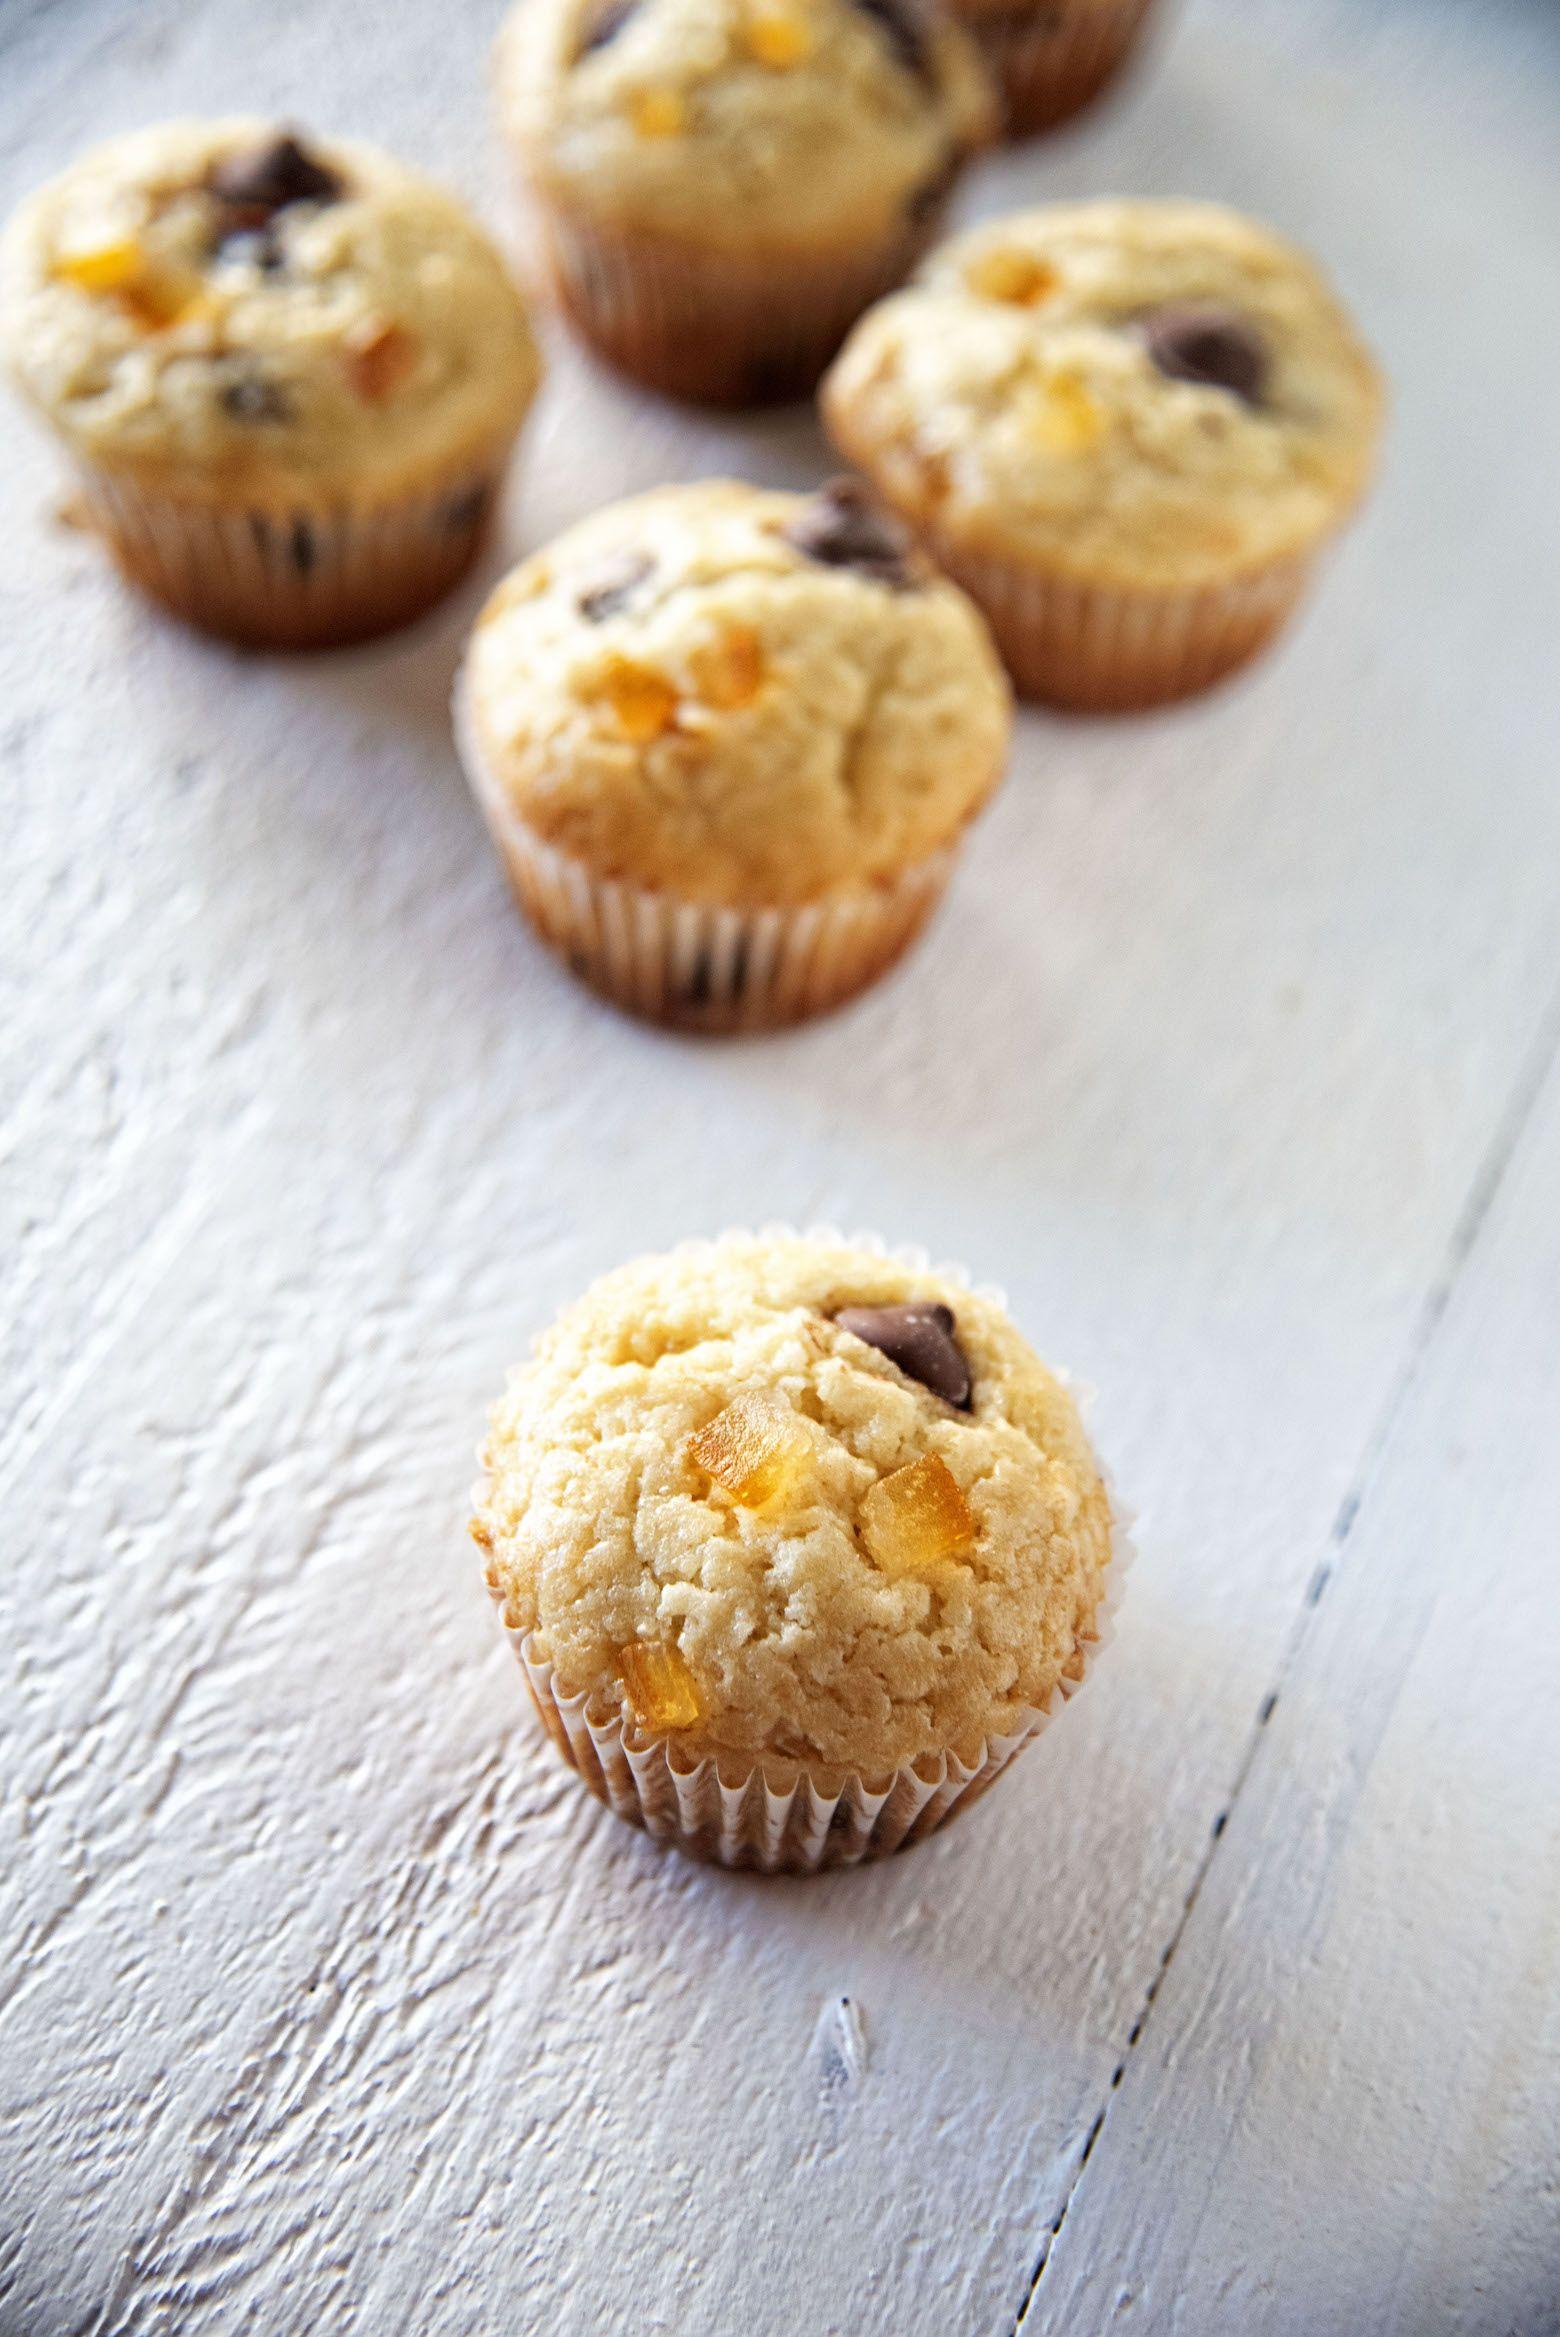 Chocolate Candied Orange Peel Sour Cream Muffins Candied Orange Peel Sour Cream Muffins Chocolate Orange Cookies